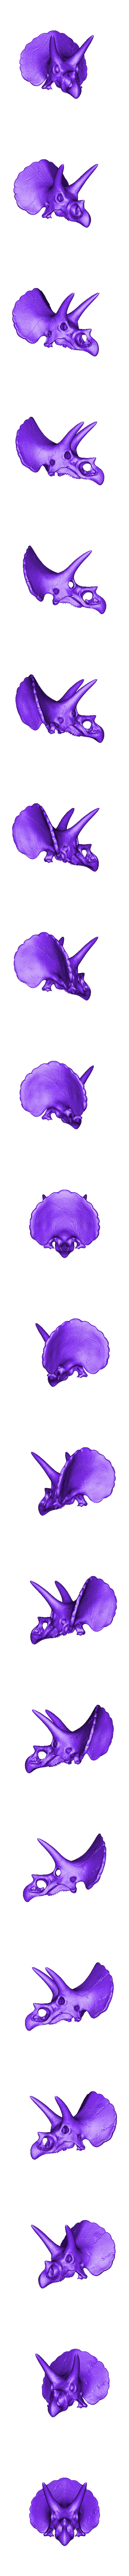 Triceratops_Skull_1.obj Download free OBJ file Triceratops Skull • 3D printable model, Dynastinae